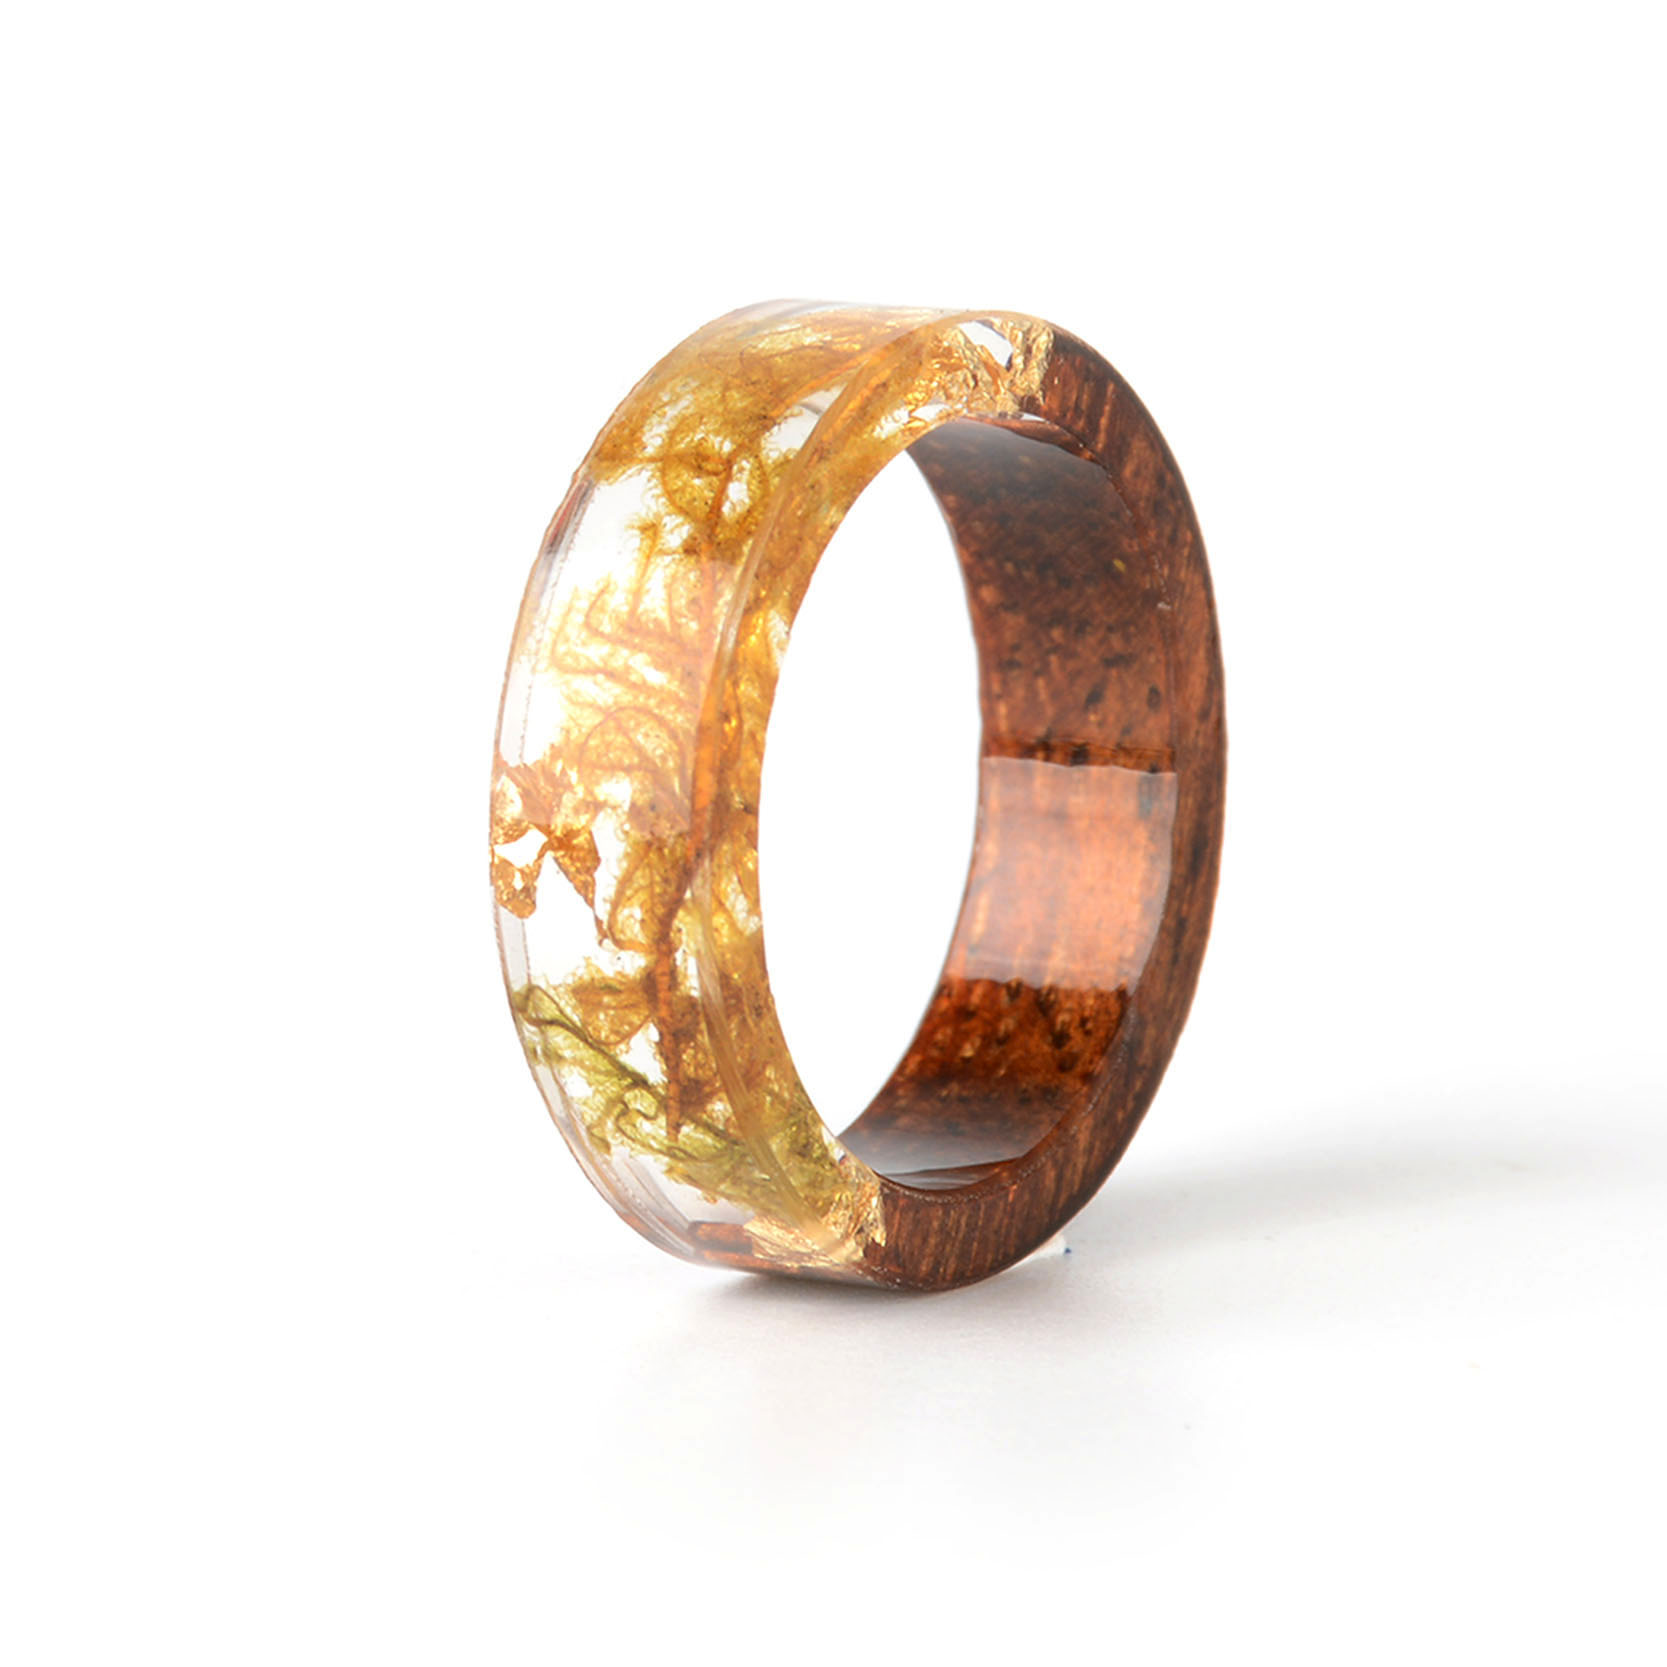 Handmade Wood Resin Ring Many Styles 21